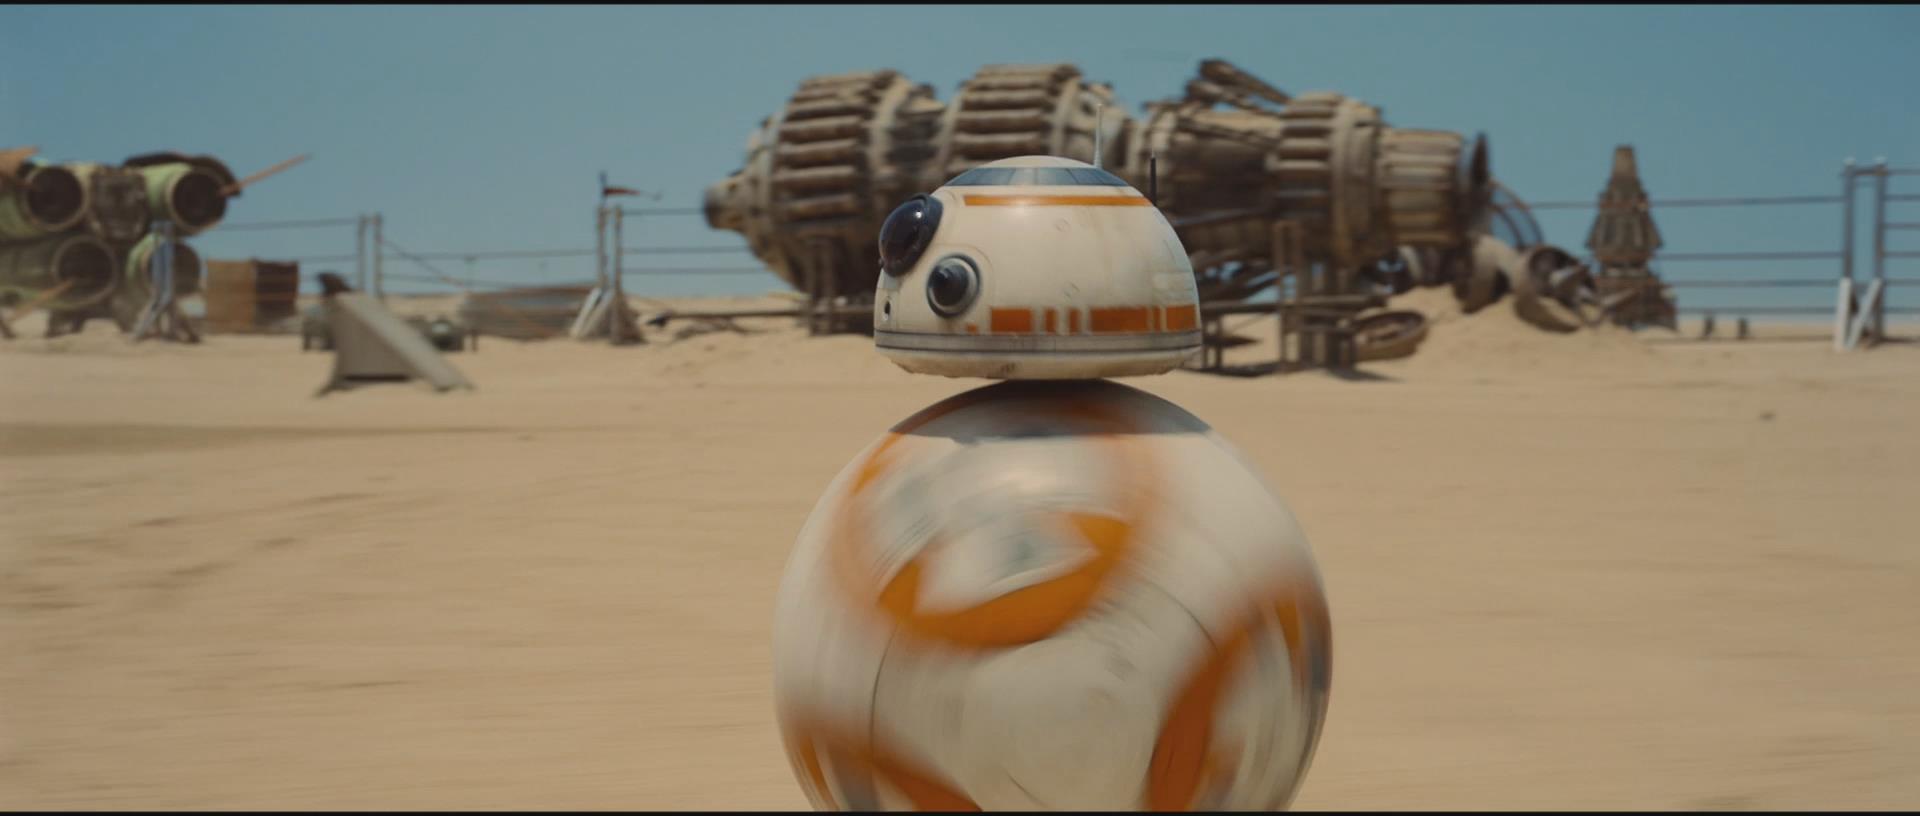 Star Wars – Ball Droid